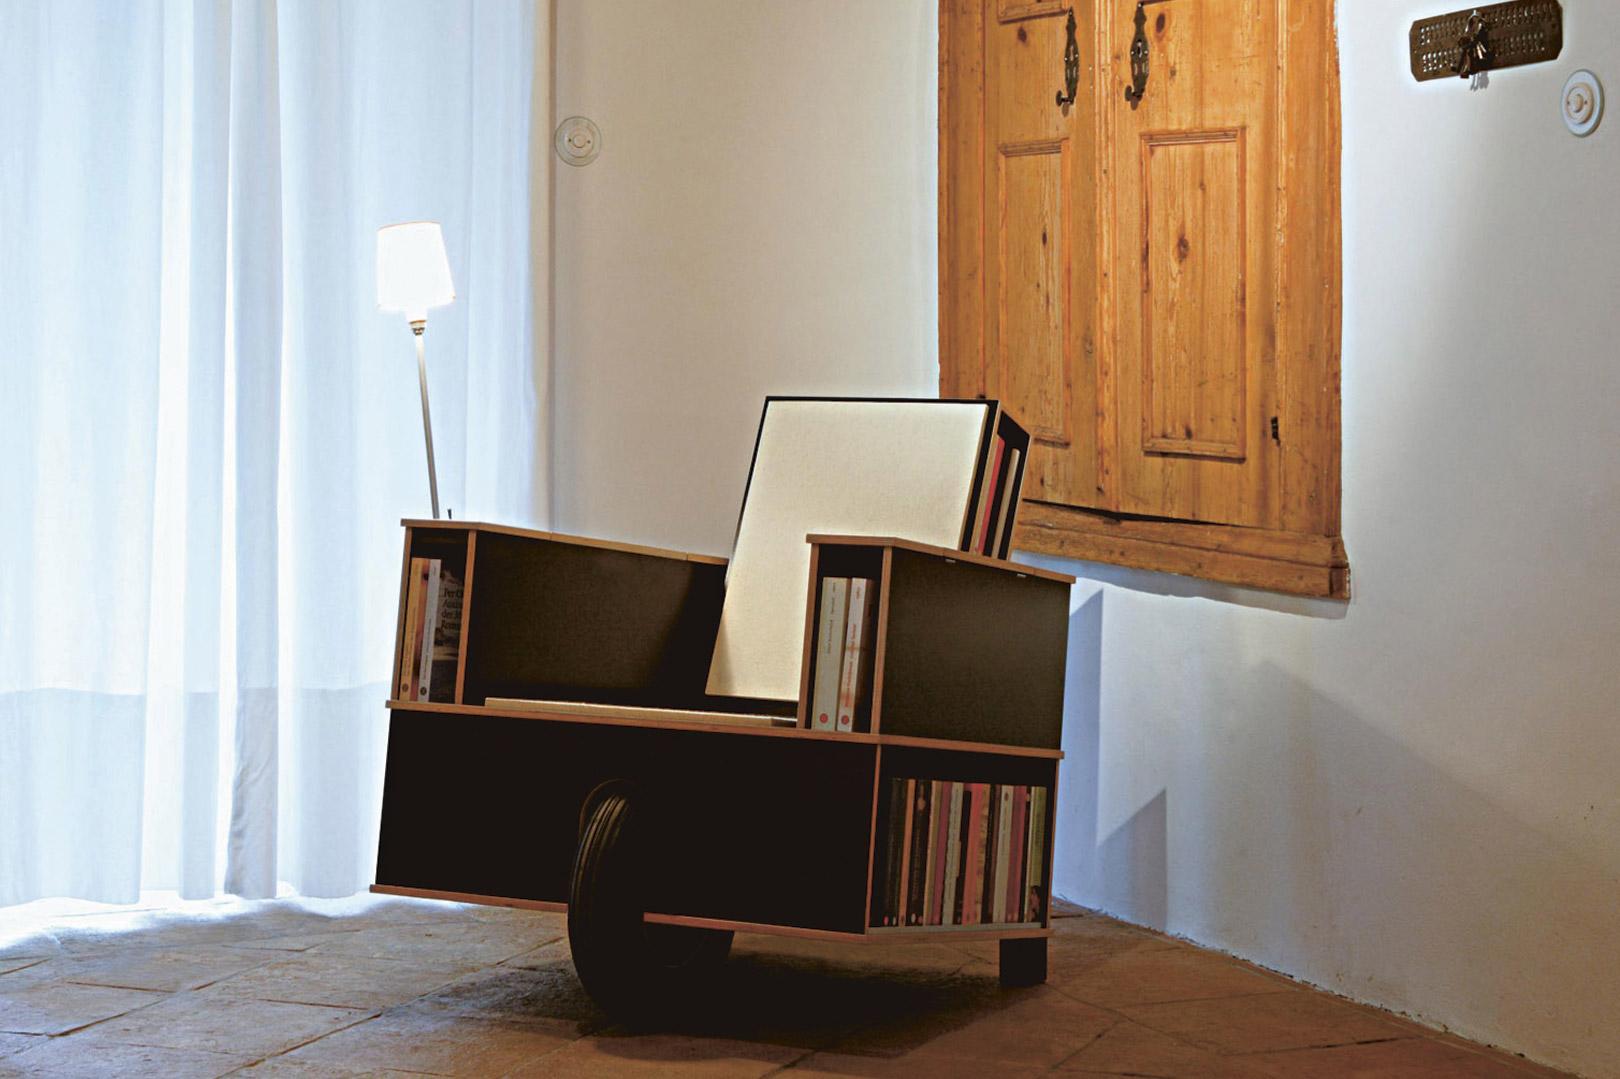 nils holger moormann bookinist jan luppes interieurs. Black Bedroom Furniture Sets. Home Design Ideas